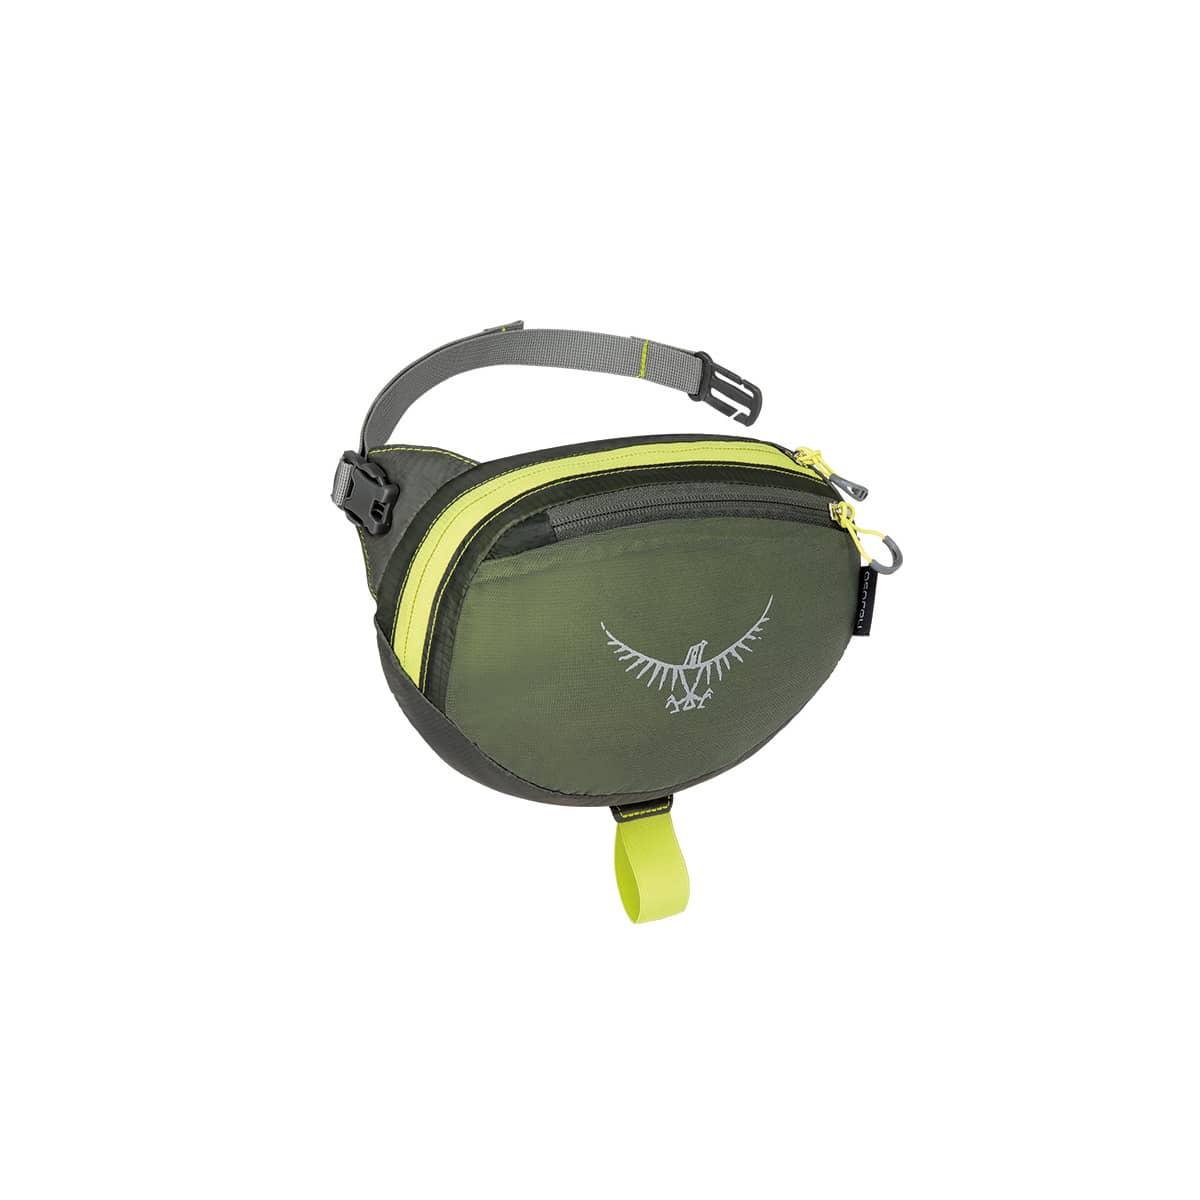 OSPREY(オスプレー) ULグラブバッグ シャドーグレー OS58100